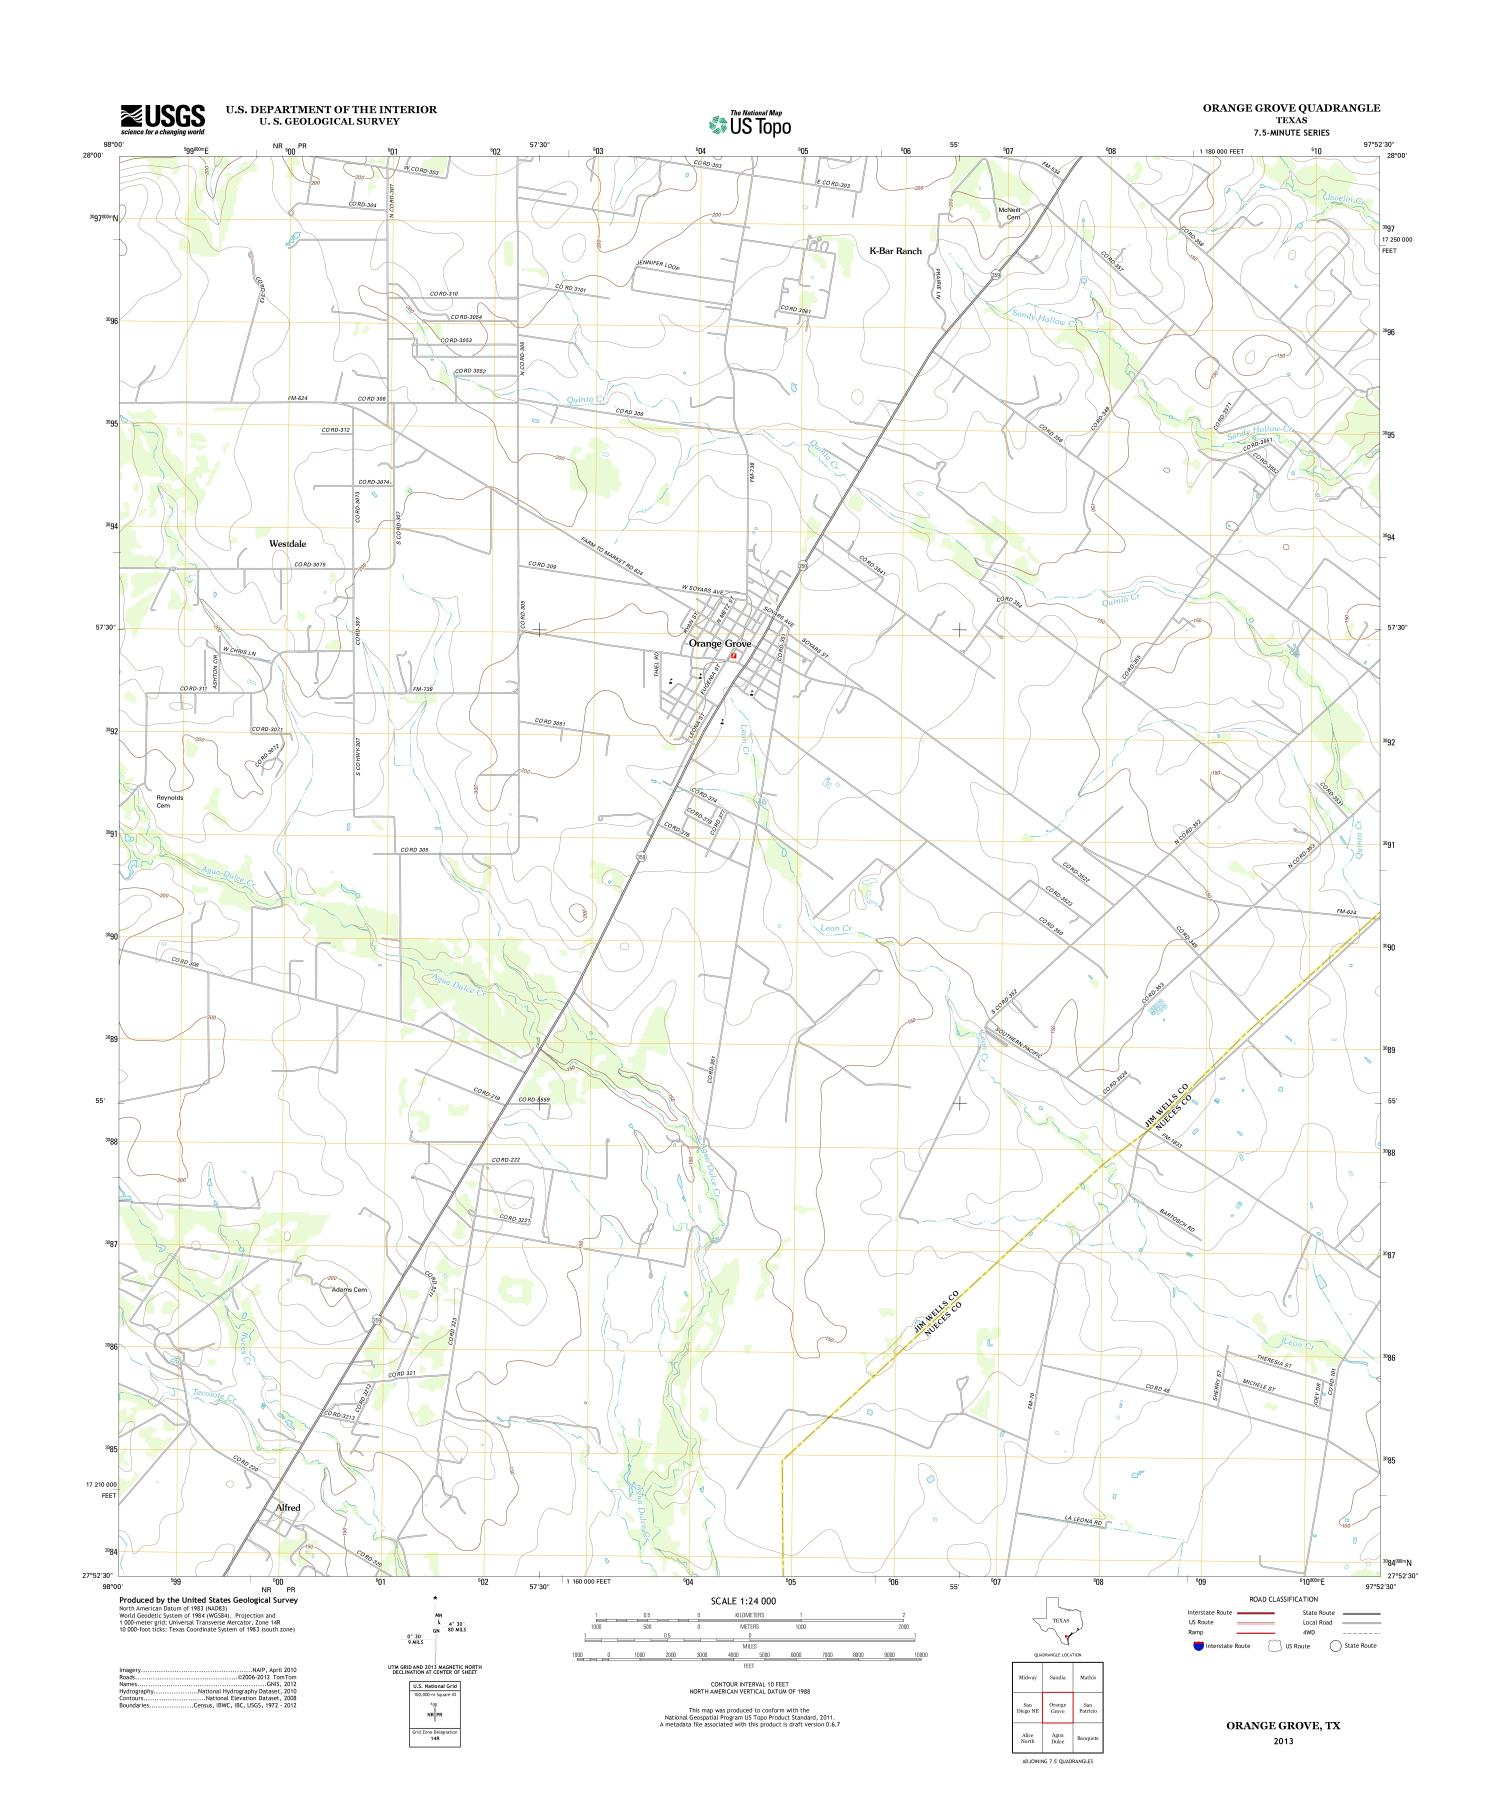 Orange Grove Quadrangle - The Portal to Texas History